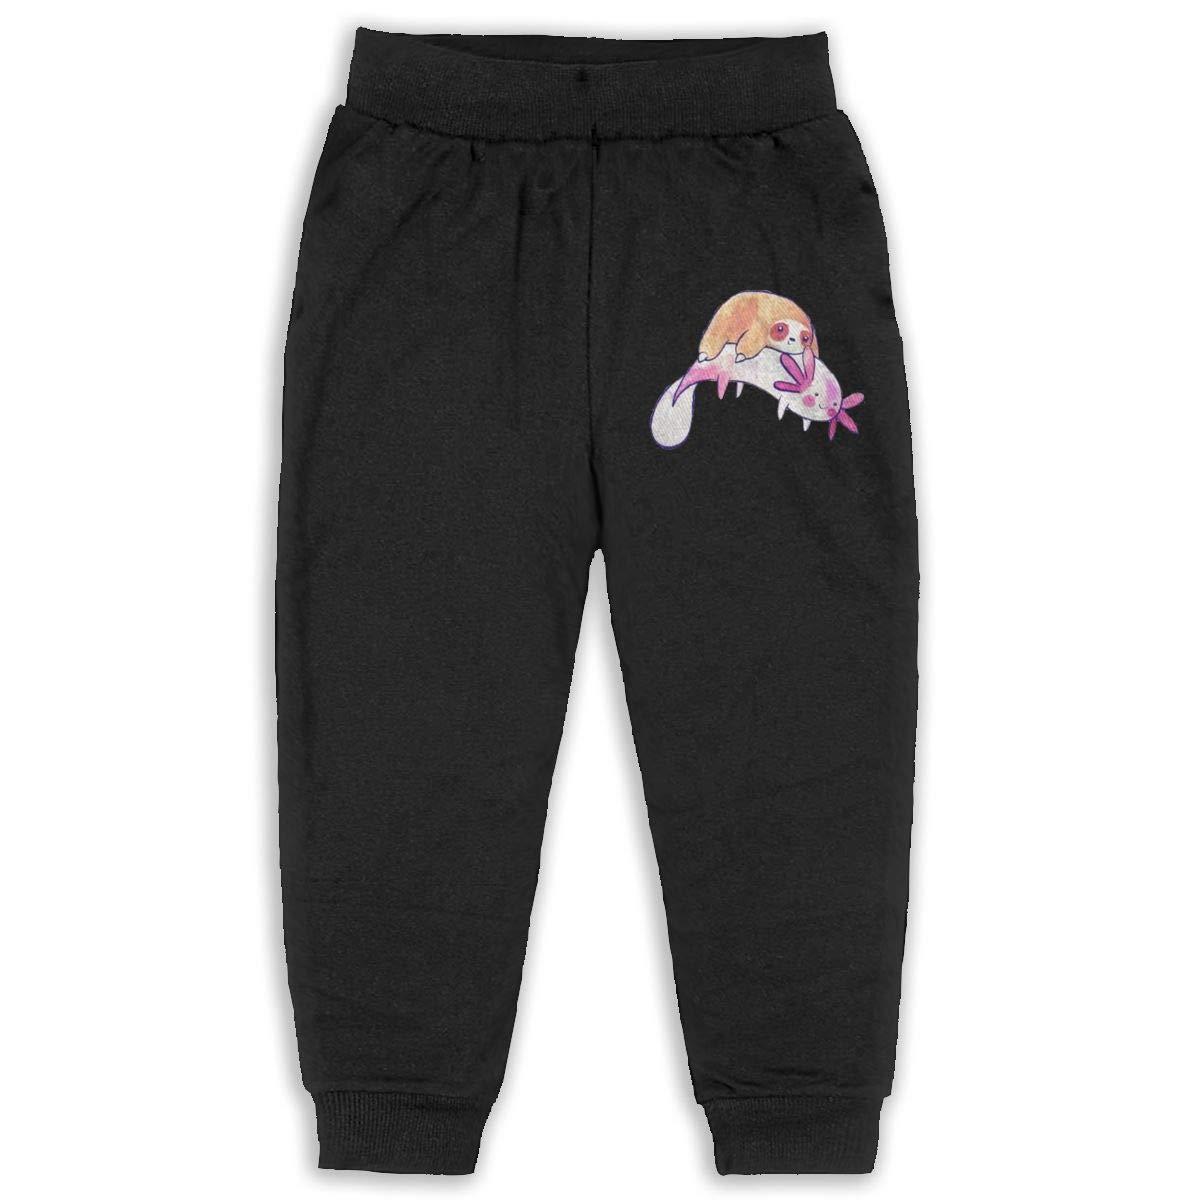 Fleece Active Joggers Elastic Pants DaXi1 Sloth Sweatpants for Boys /& Girls